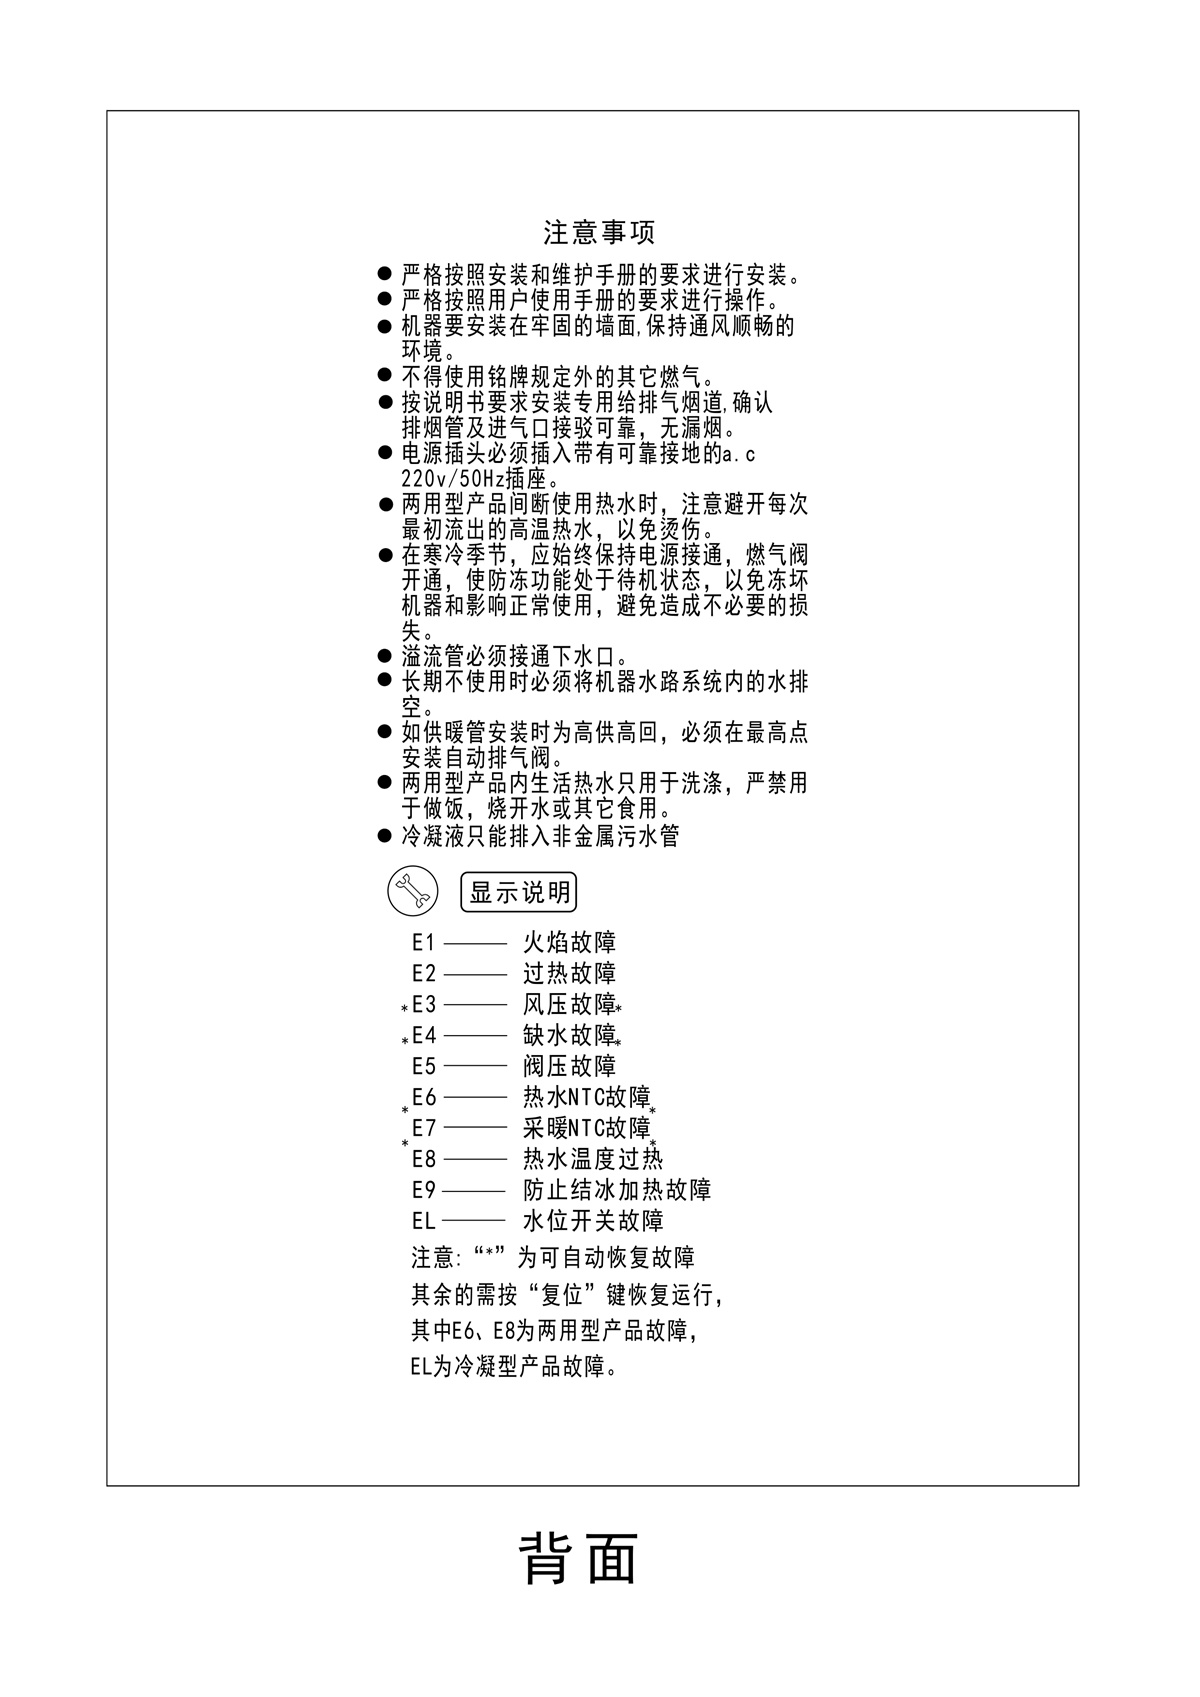 ES06系列-用户使用手册-10_02.jpg